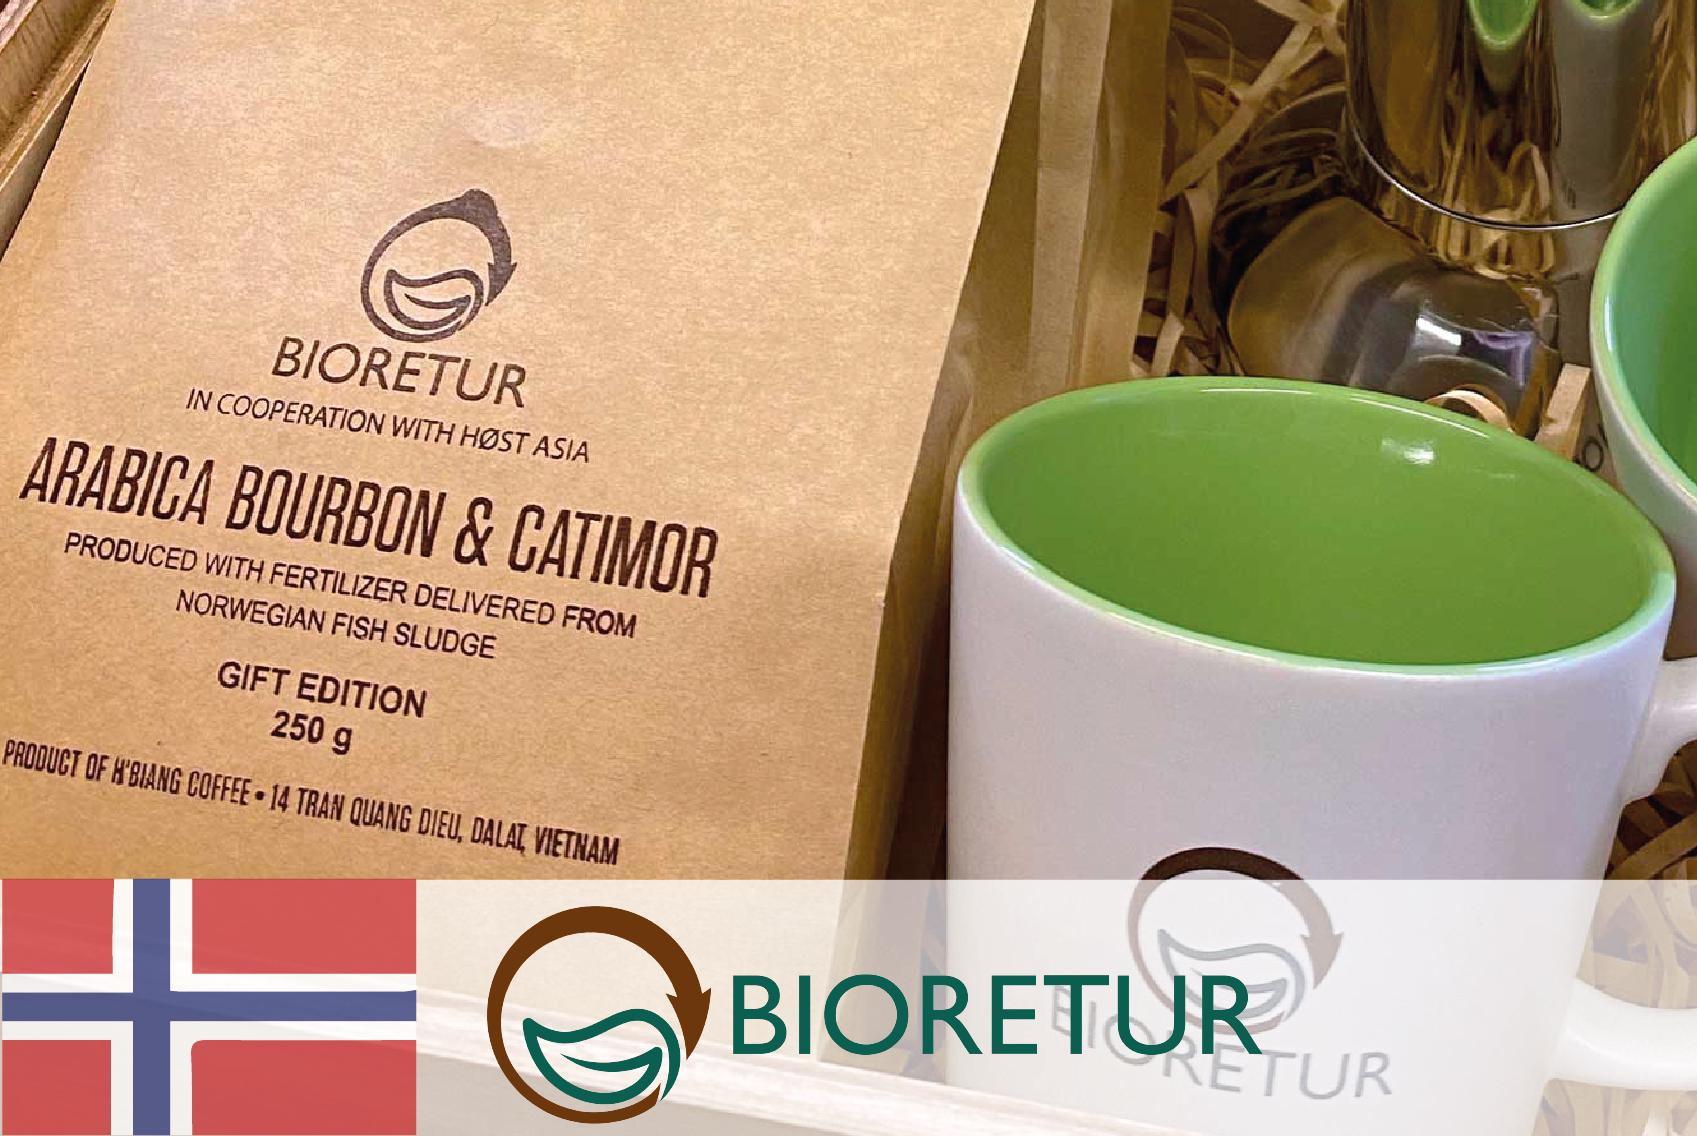 #57 Bioretur AS - Converting waste from fish farming into fertiliser - CIRCit Nord